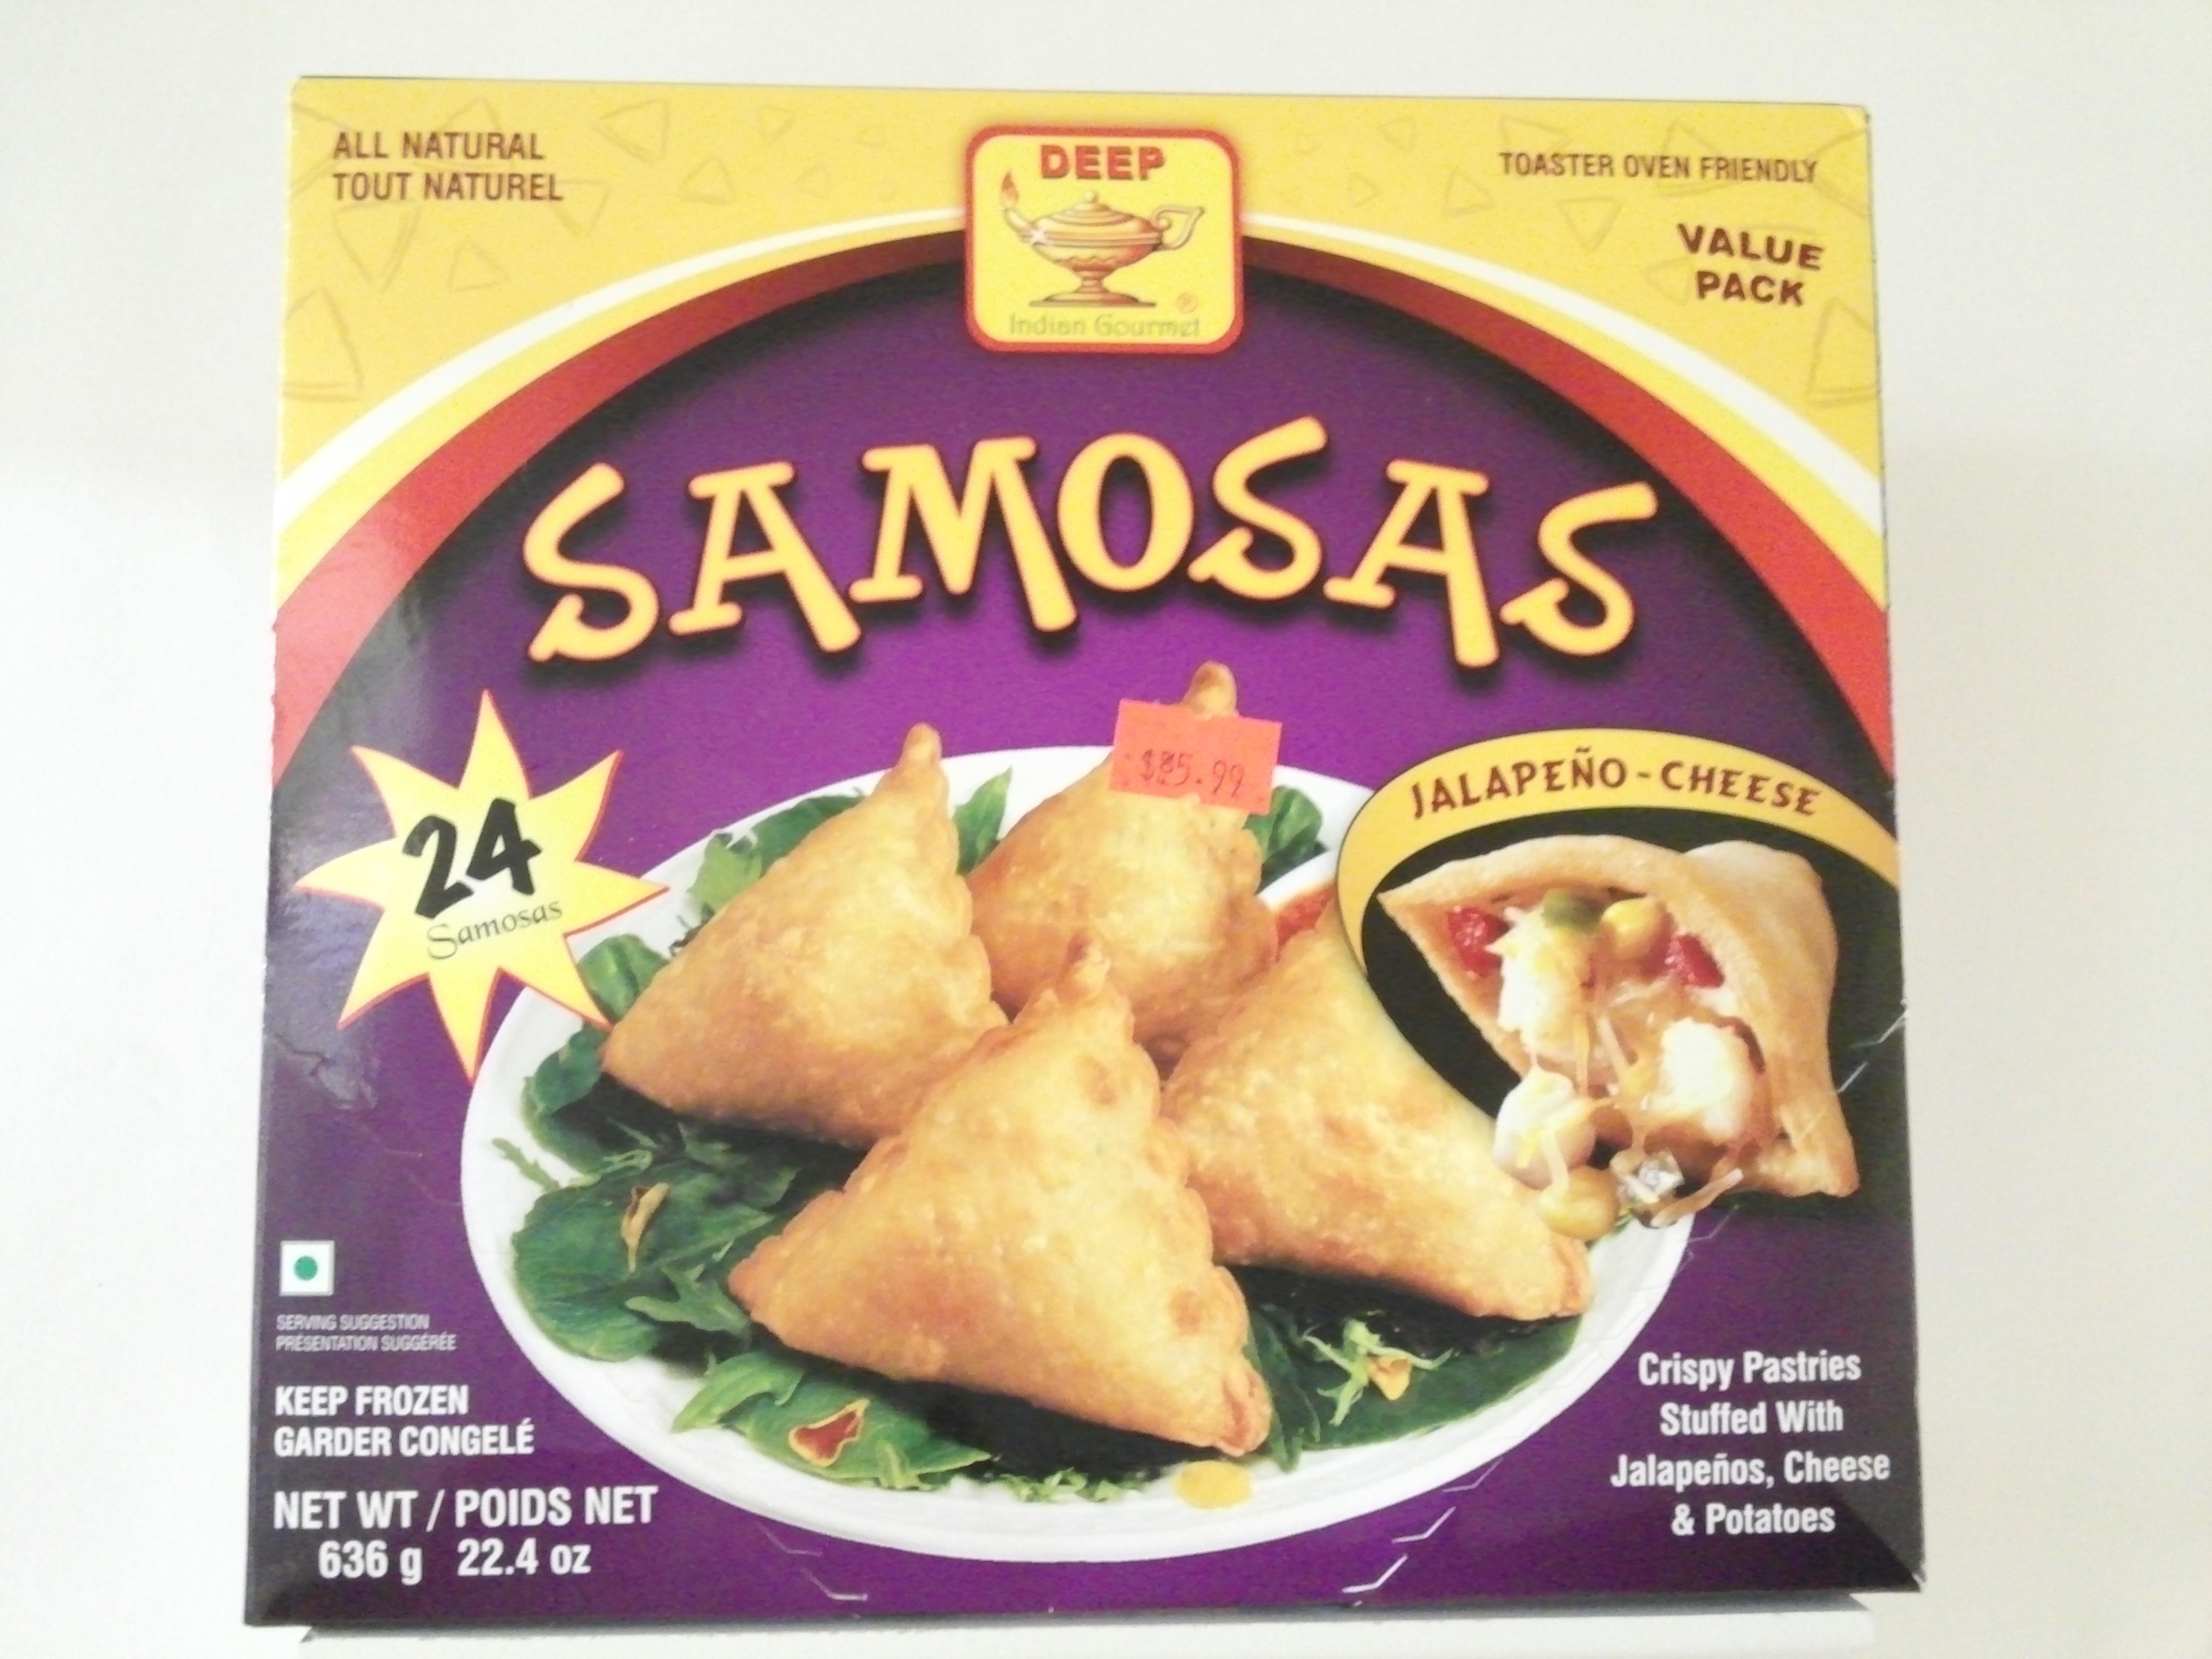 Deep Samosas Jalapeno-Cheese 24 pcs 22.4 oz